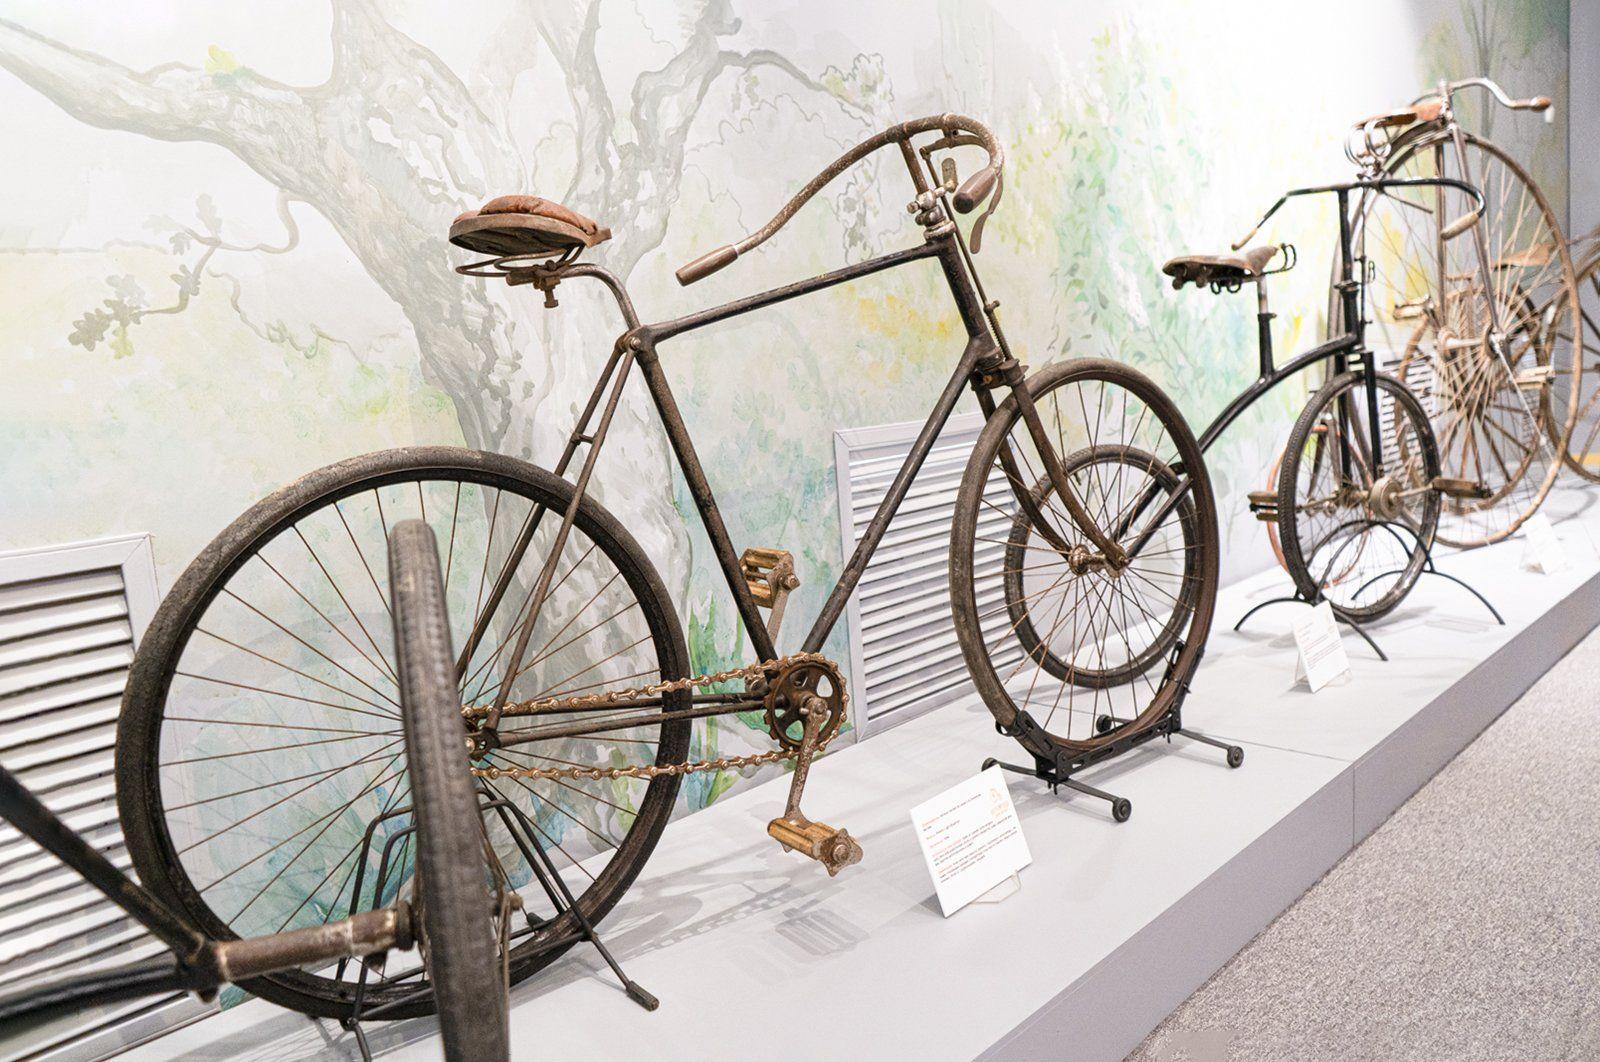 Велосипед типа «сейфти»